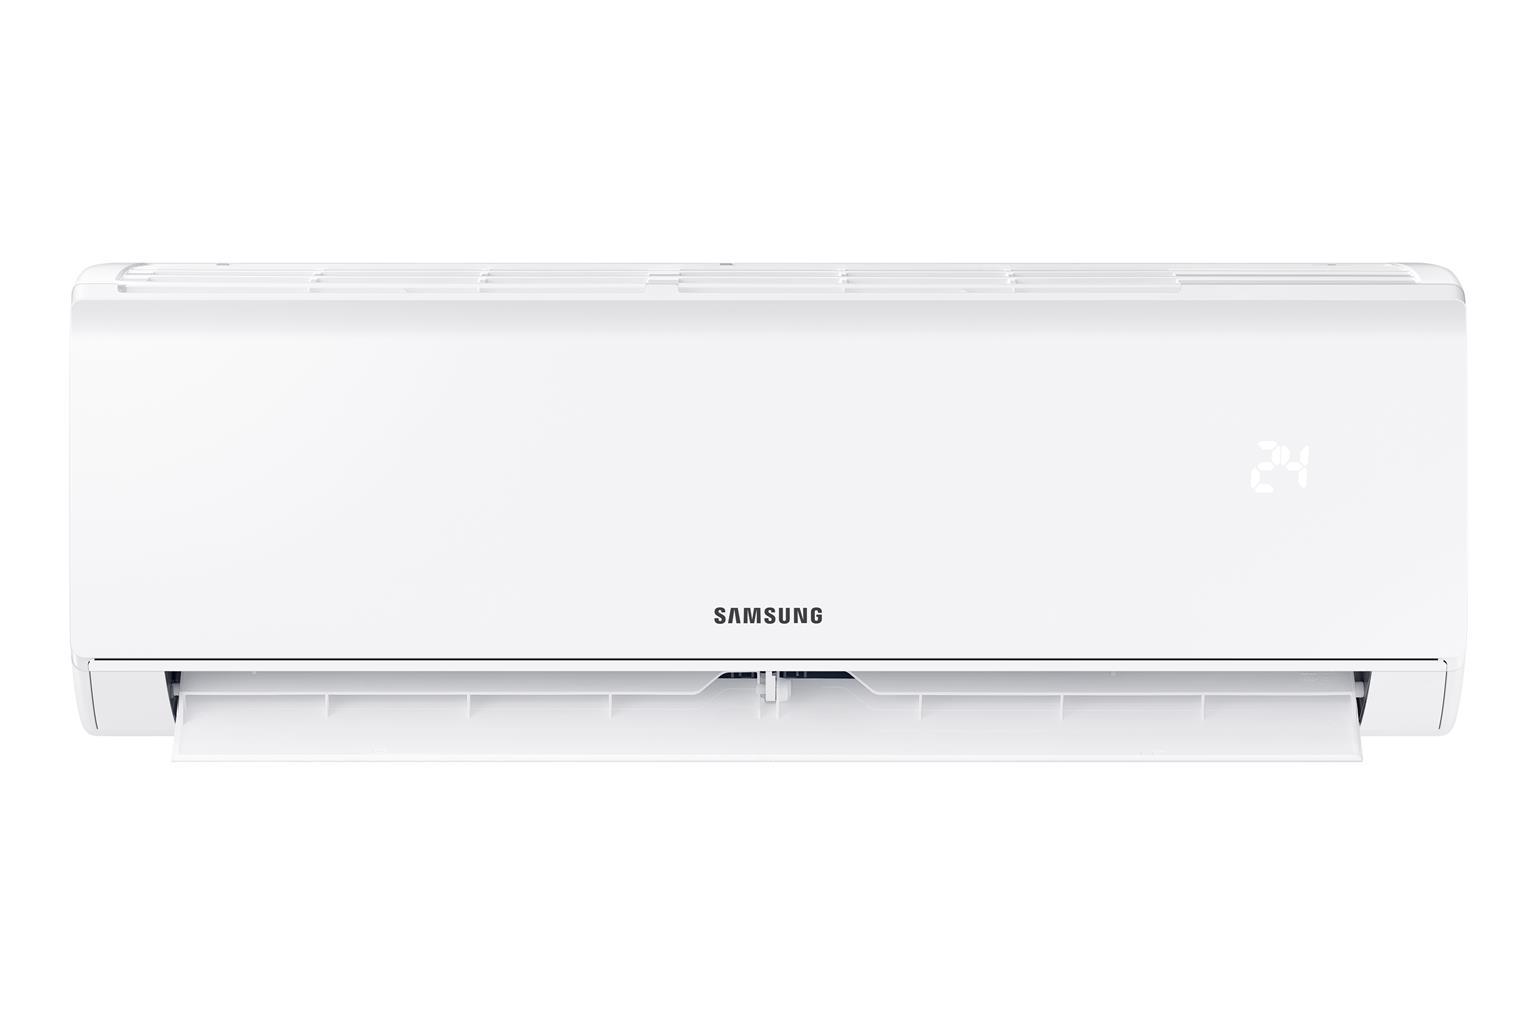 Samsung new model aircon split units